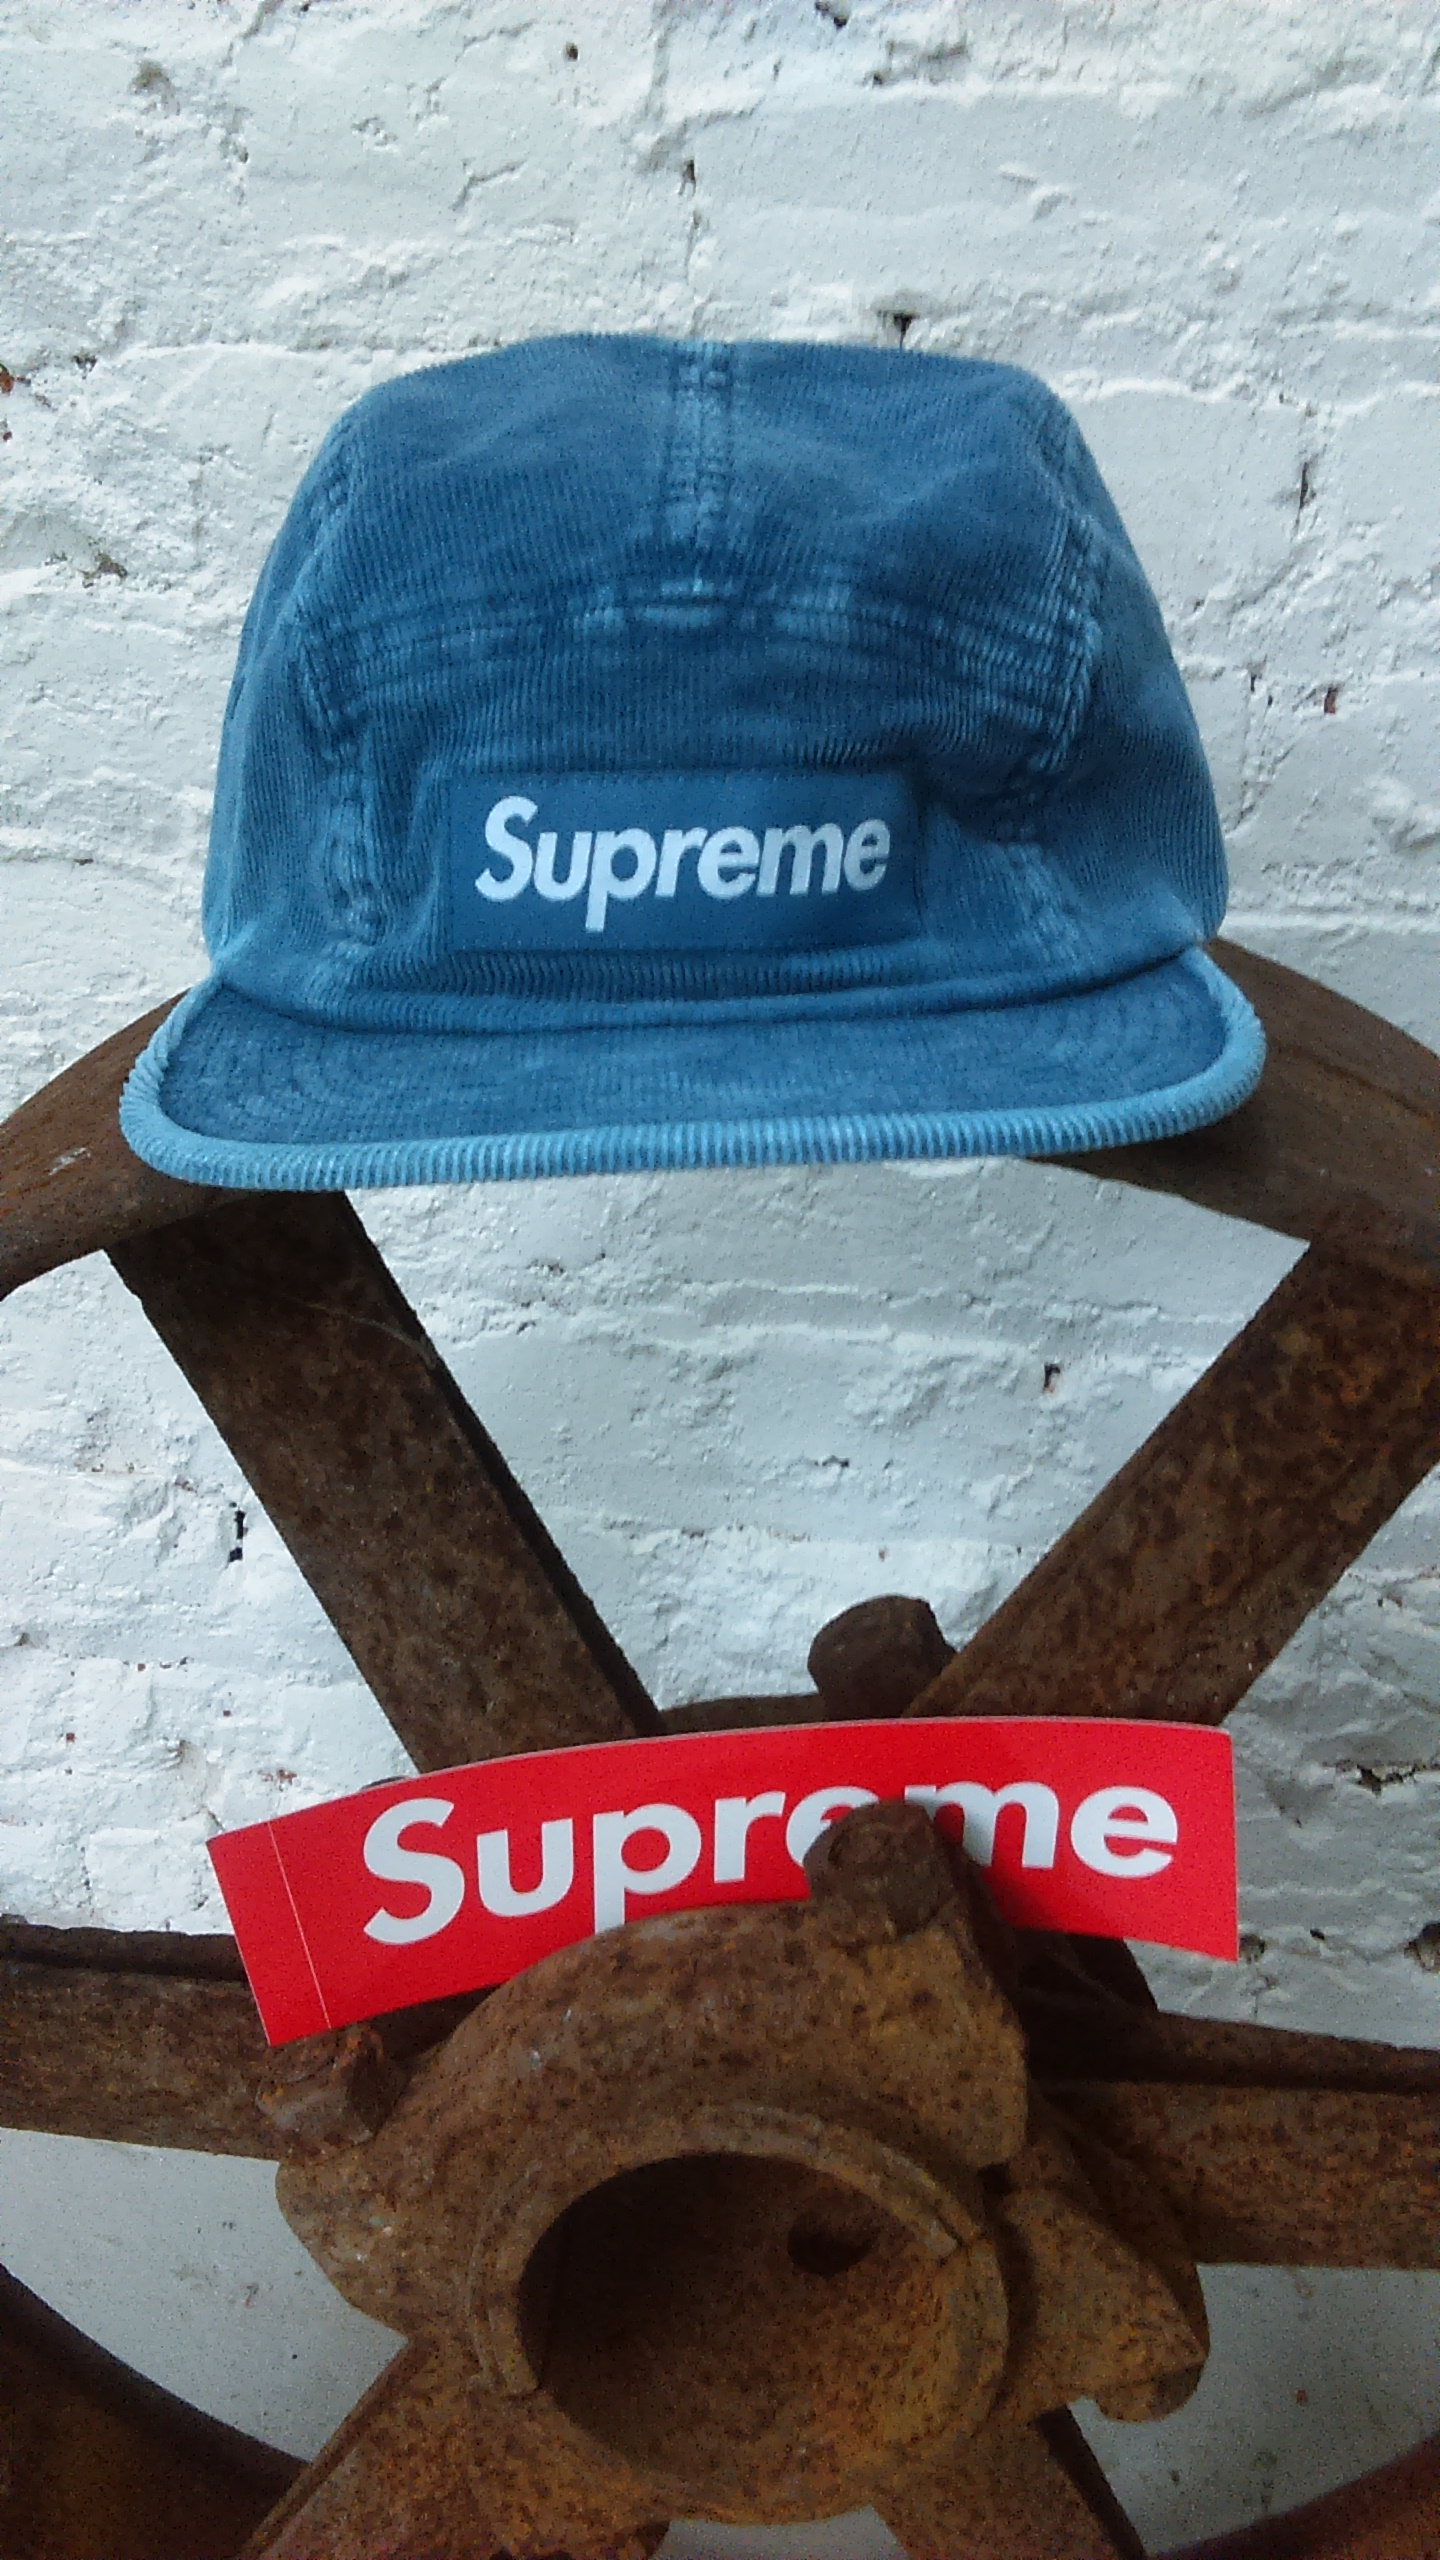 4dbe774e713 Supreme Supreme SS16 Corduroy Camp Cap Blue Box Logo Hat Motion Classic  5-panel S Royal Size one size - Hats for Sale - Grailed